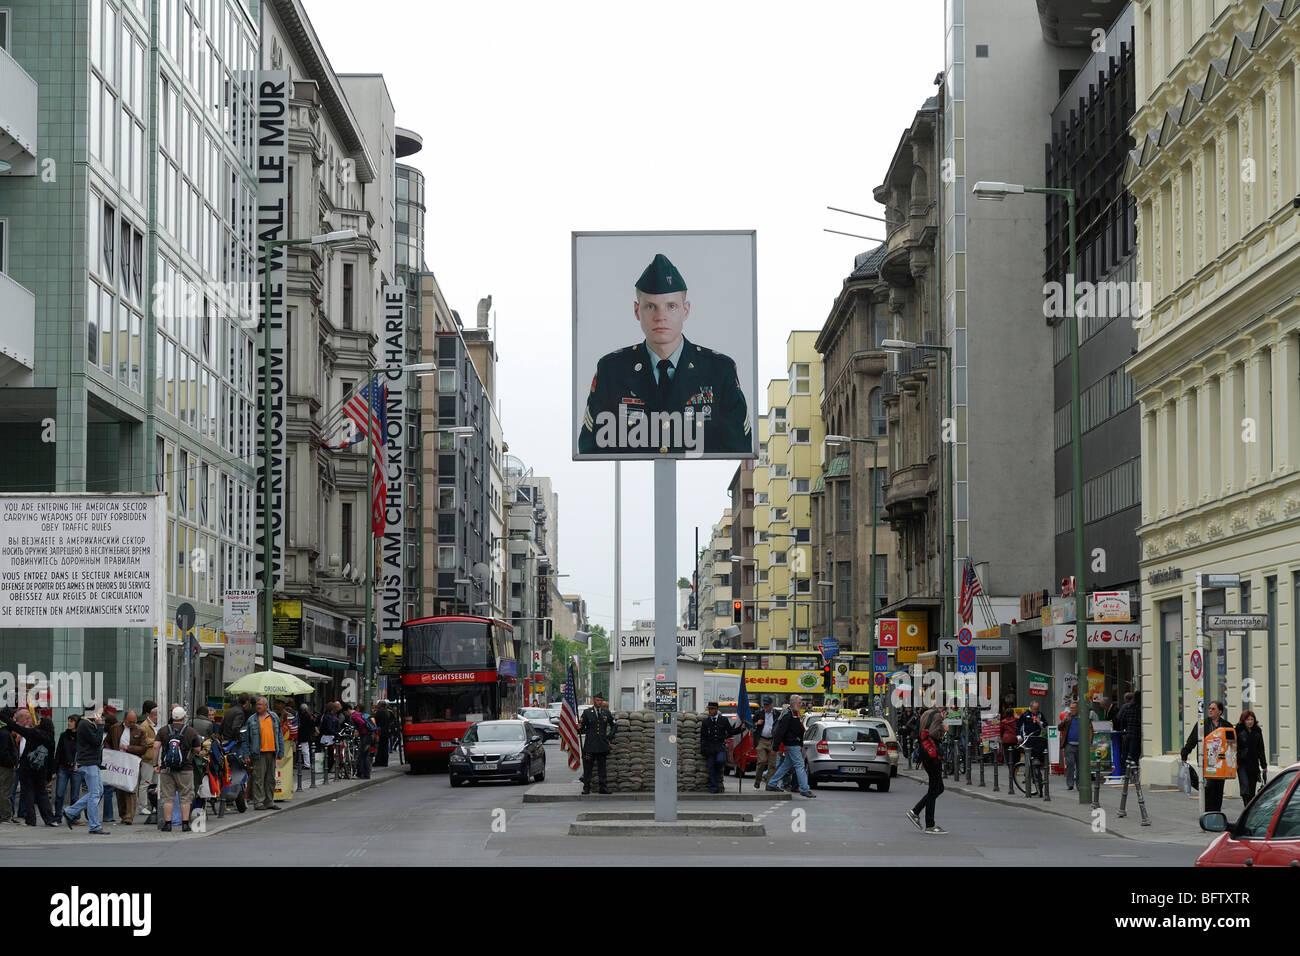 Berlín. Alemania. El Checkpoint Charlie en la Friedrichstrasse. Imagen De Stock